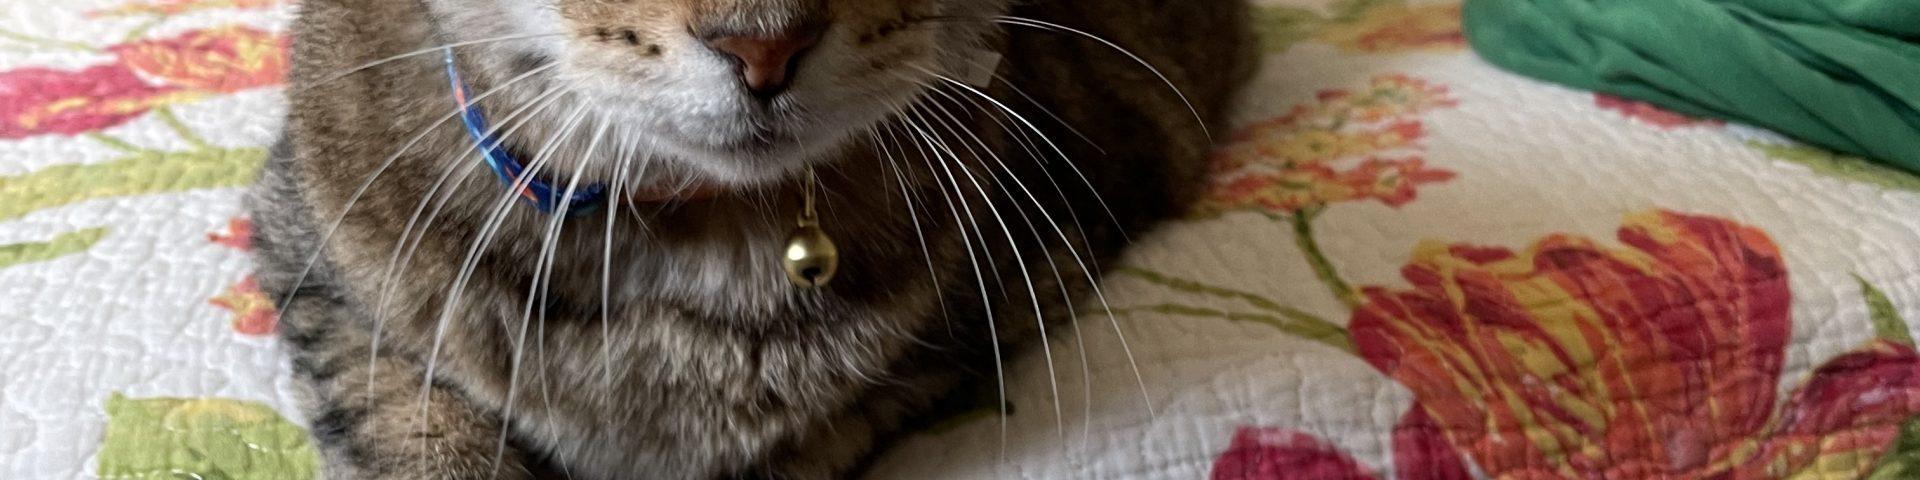 Archie The Cat